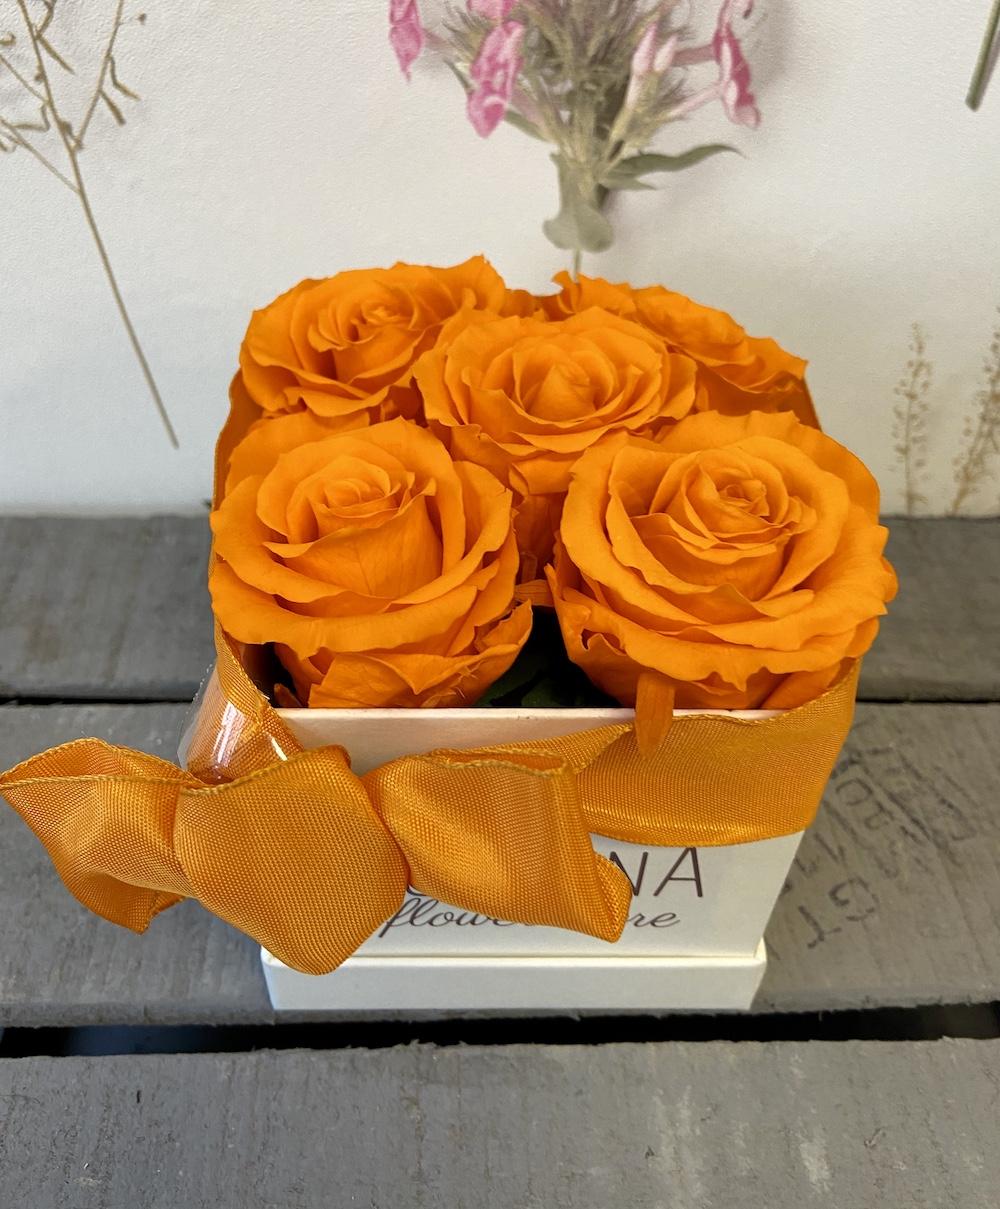 arancioflower box rose stabilizzate florashopping Rossana flower store NovellinoIMG_0372